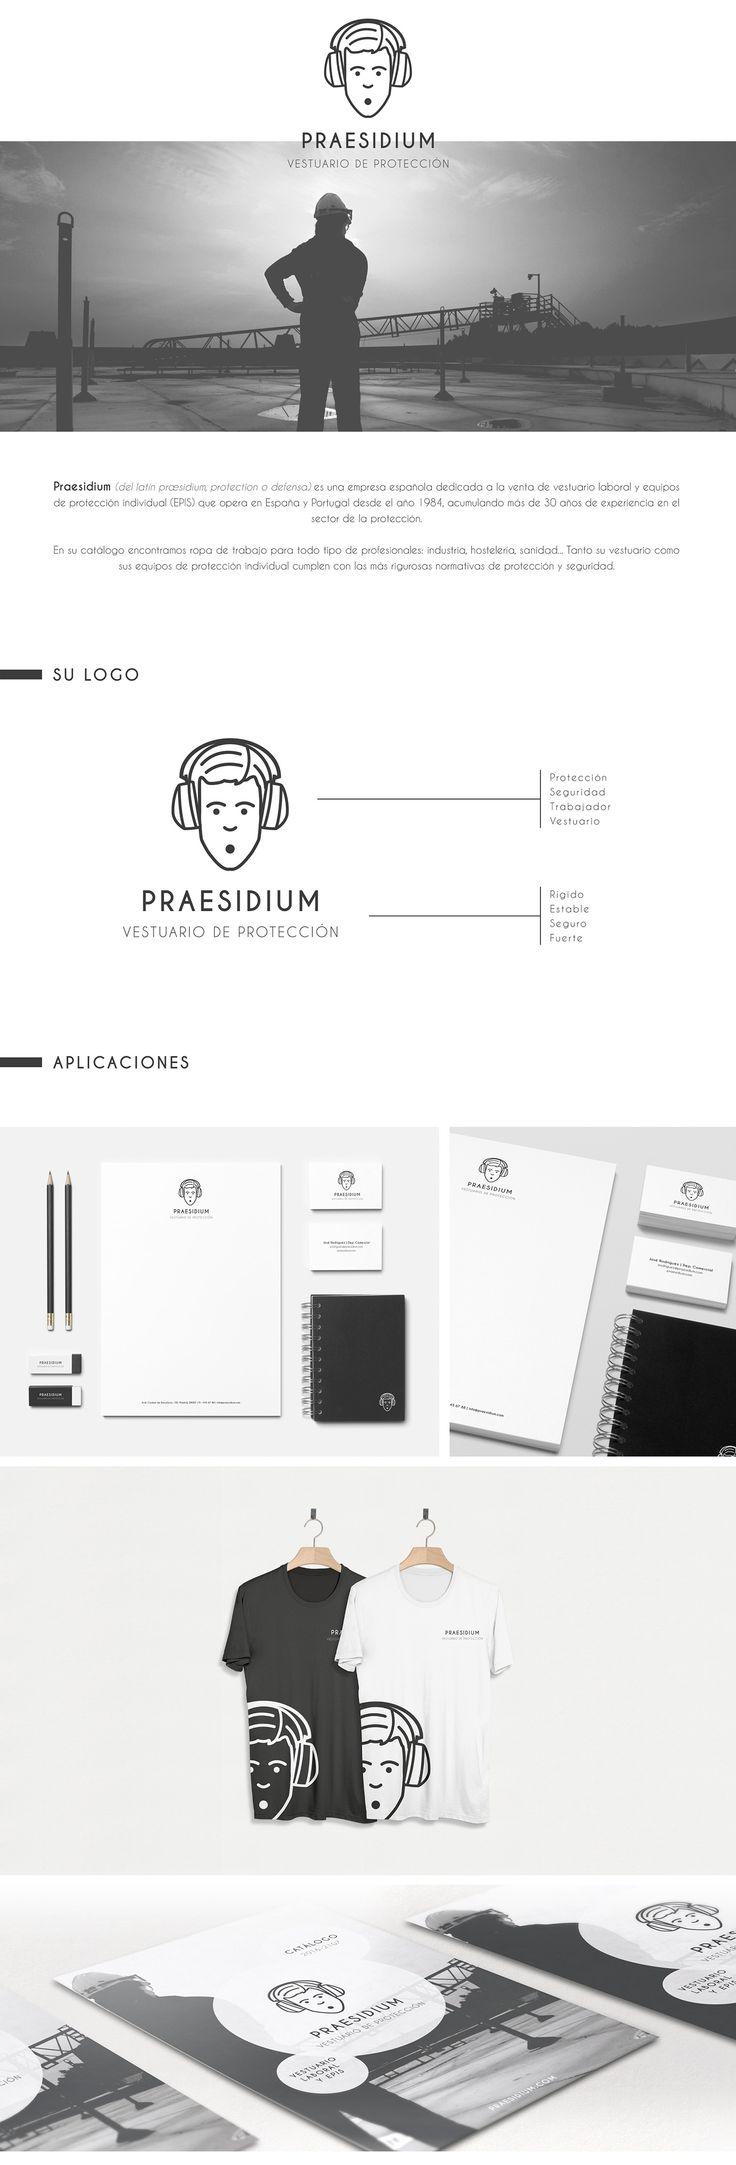 PRAESIDIUM - Vestuario de Protección on Behance #logo #brand #branding #marca #identidadvisual